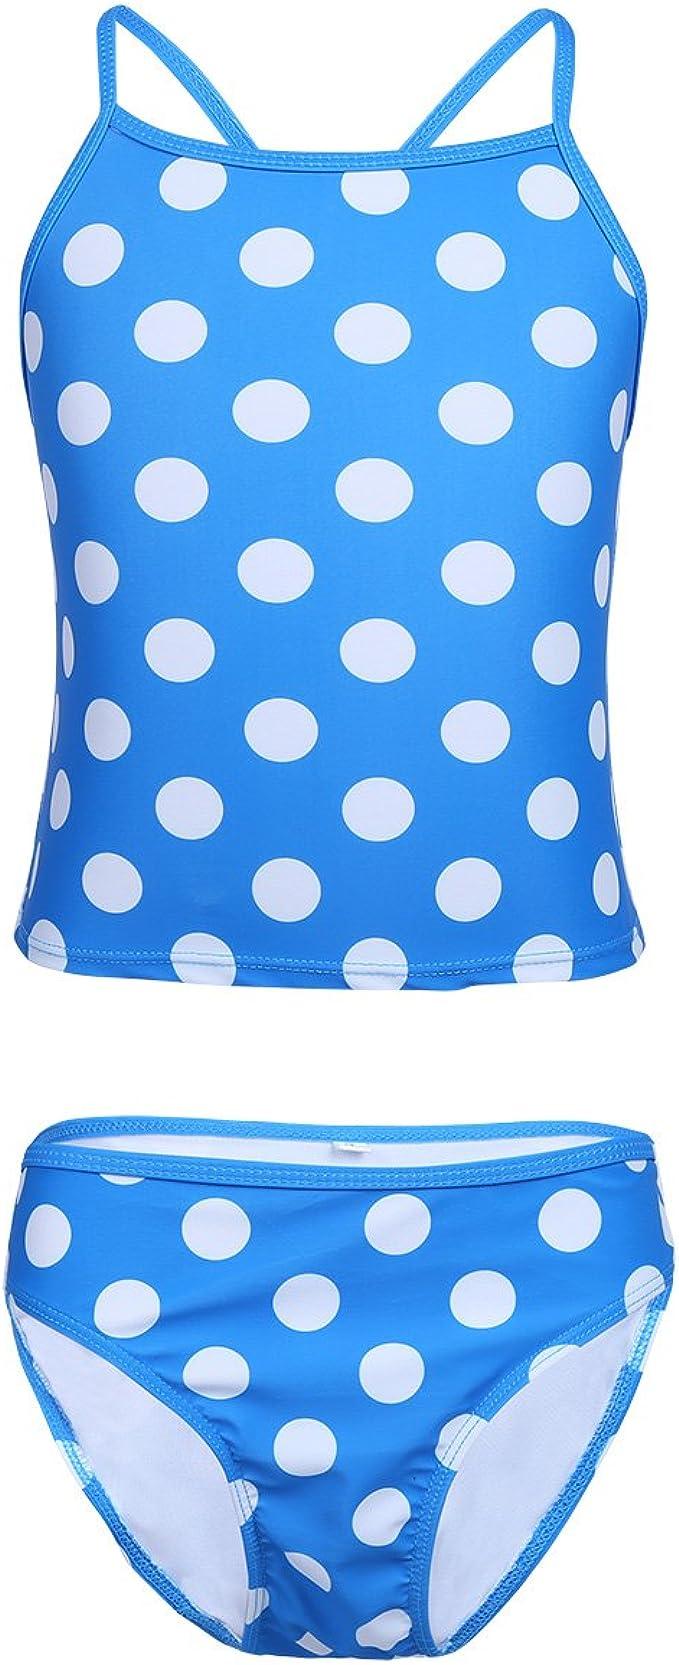 easyforever Kids Girls 2PCS Tankini Swimsuit Heart Shaped Printed Crop Top with Short Set Swimwear Beach Wear